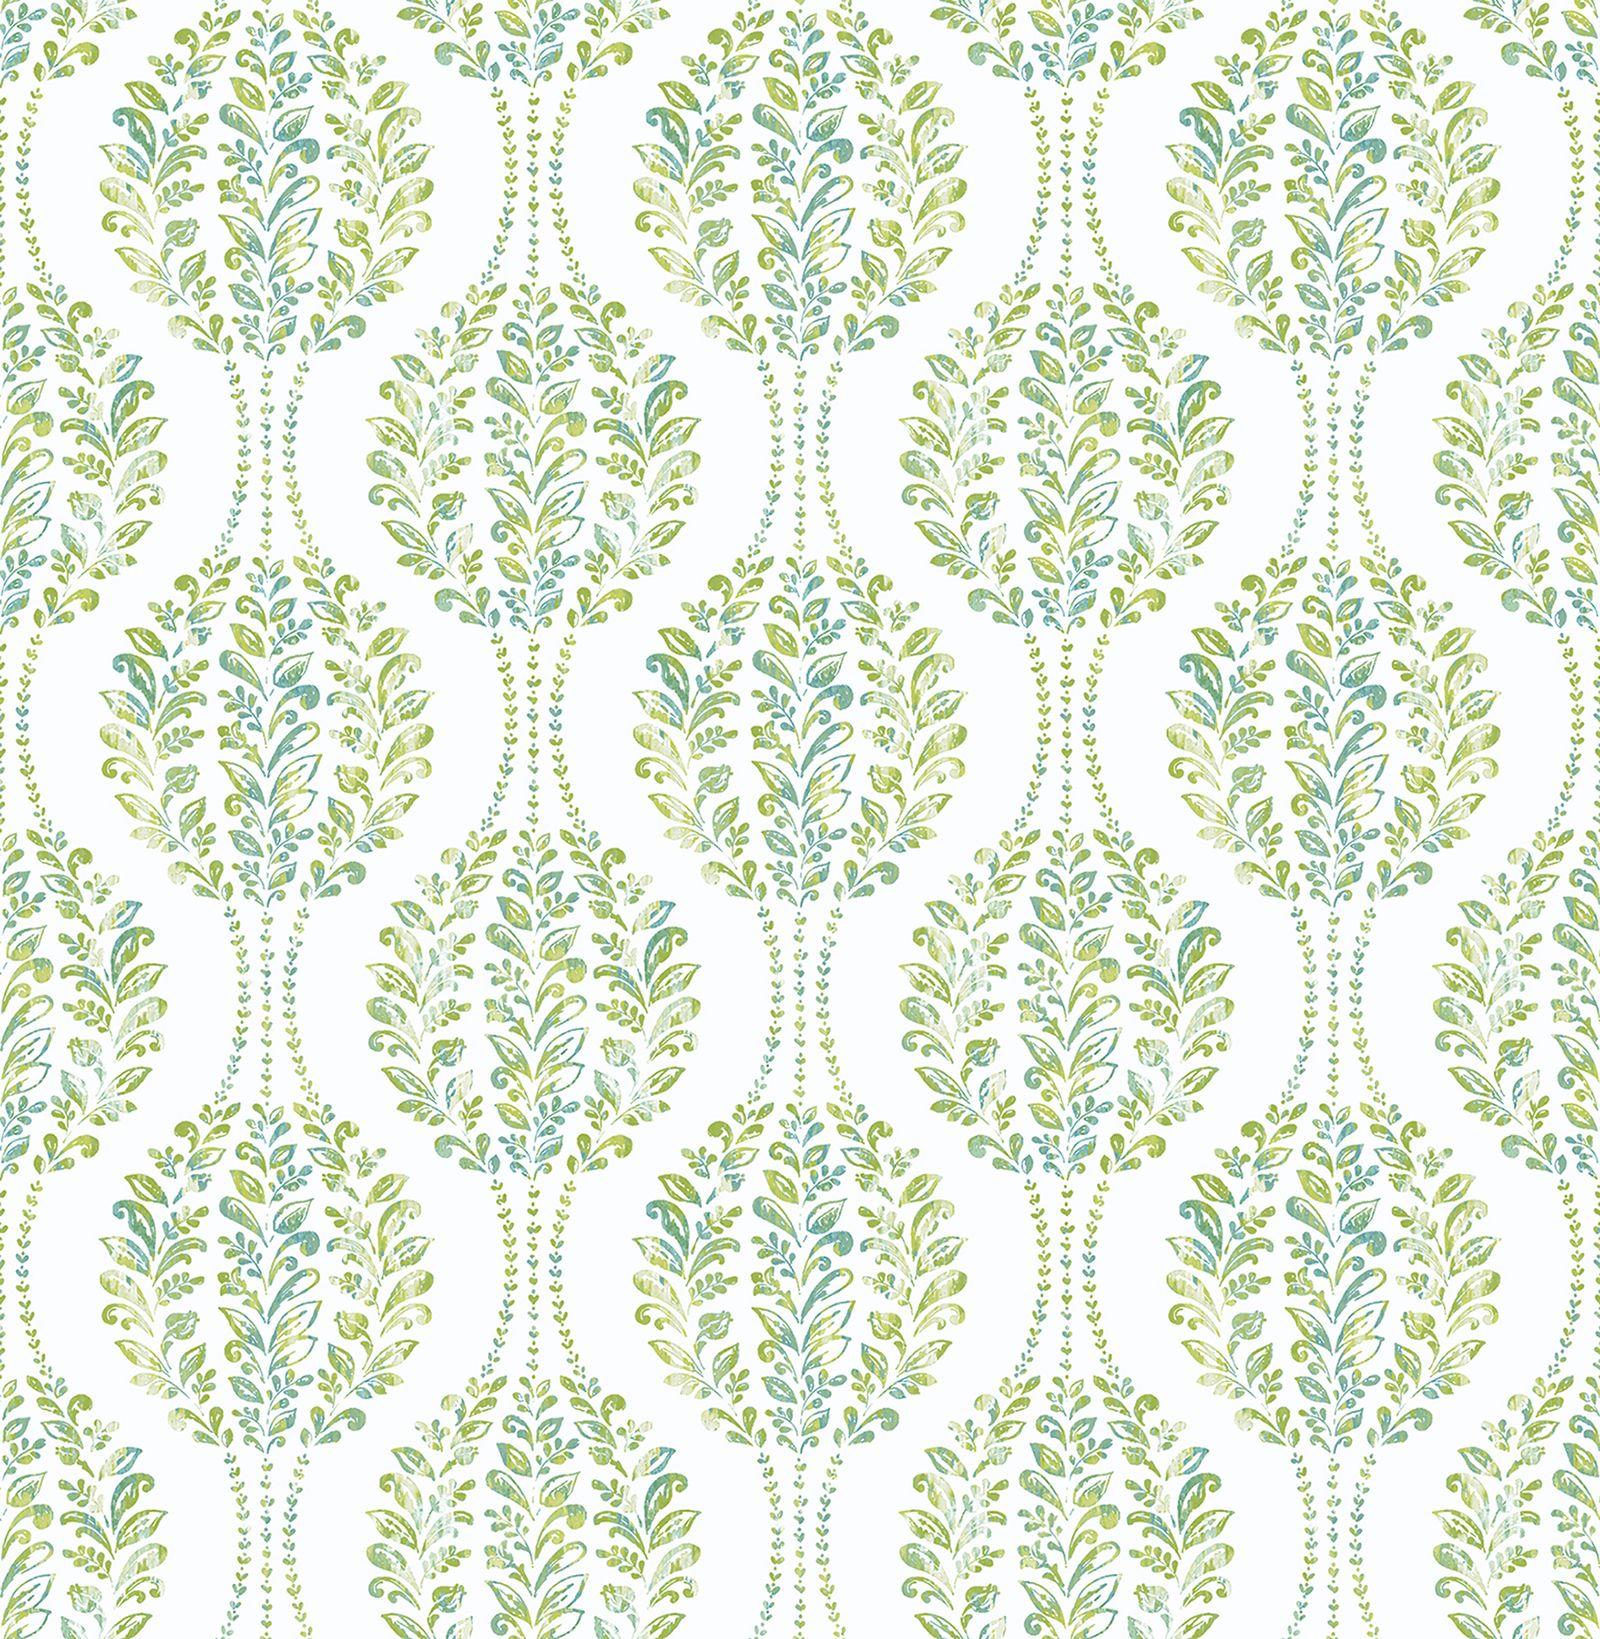 A-Street Prints Versailles Green Floral Damask Wallpaper